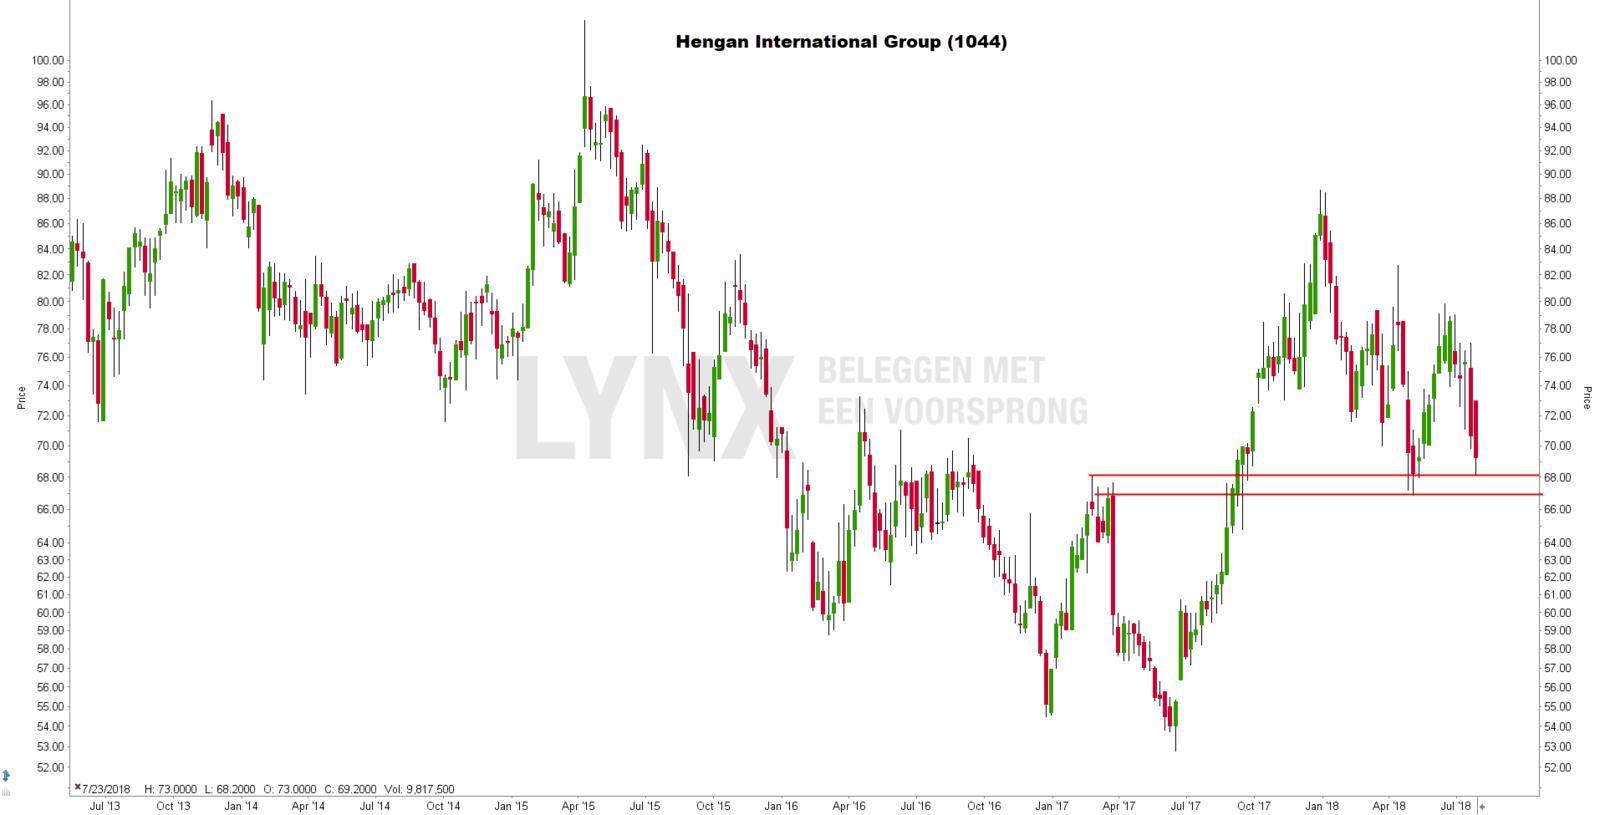 Koersgrafiek van het aandeel Hengan International Group - Chinese aandelen